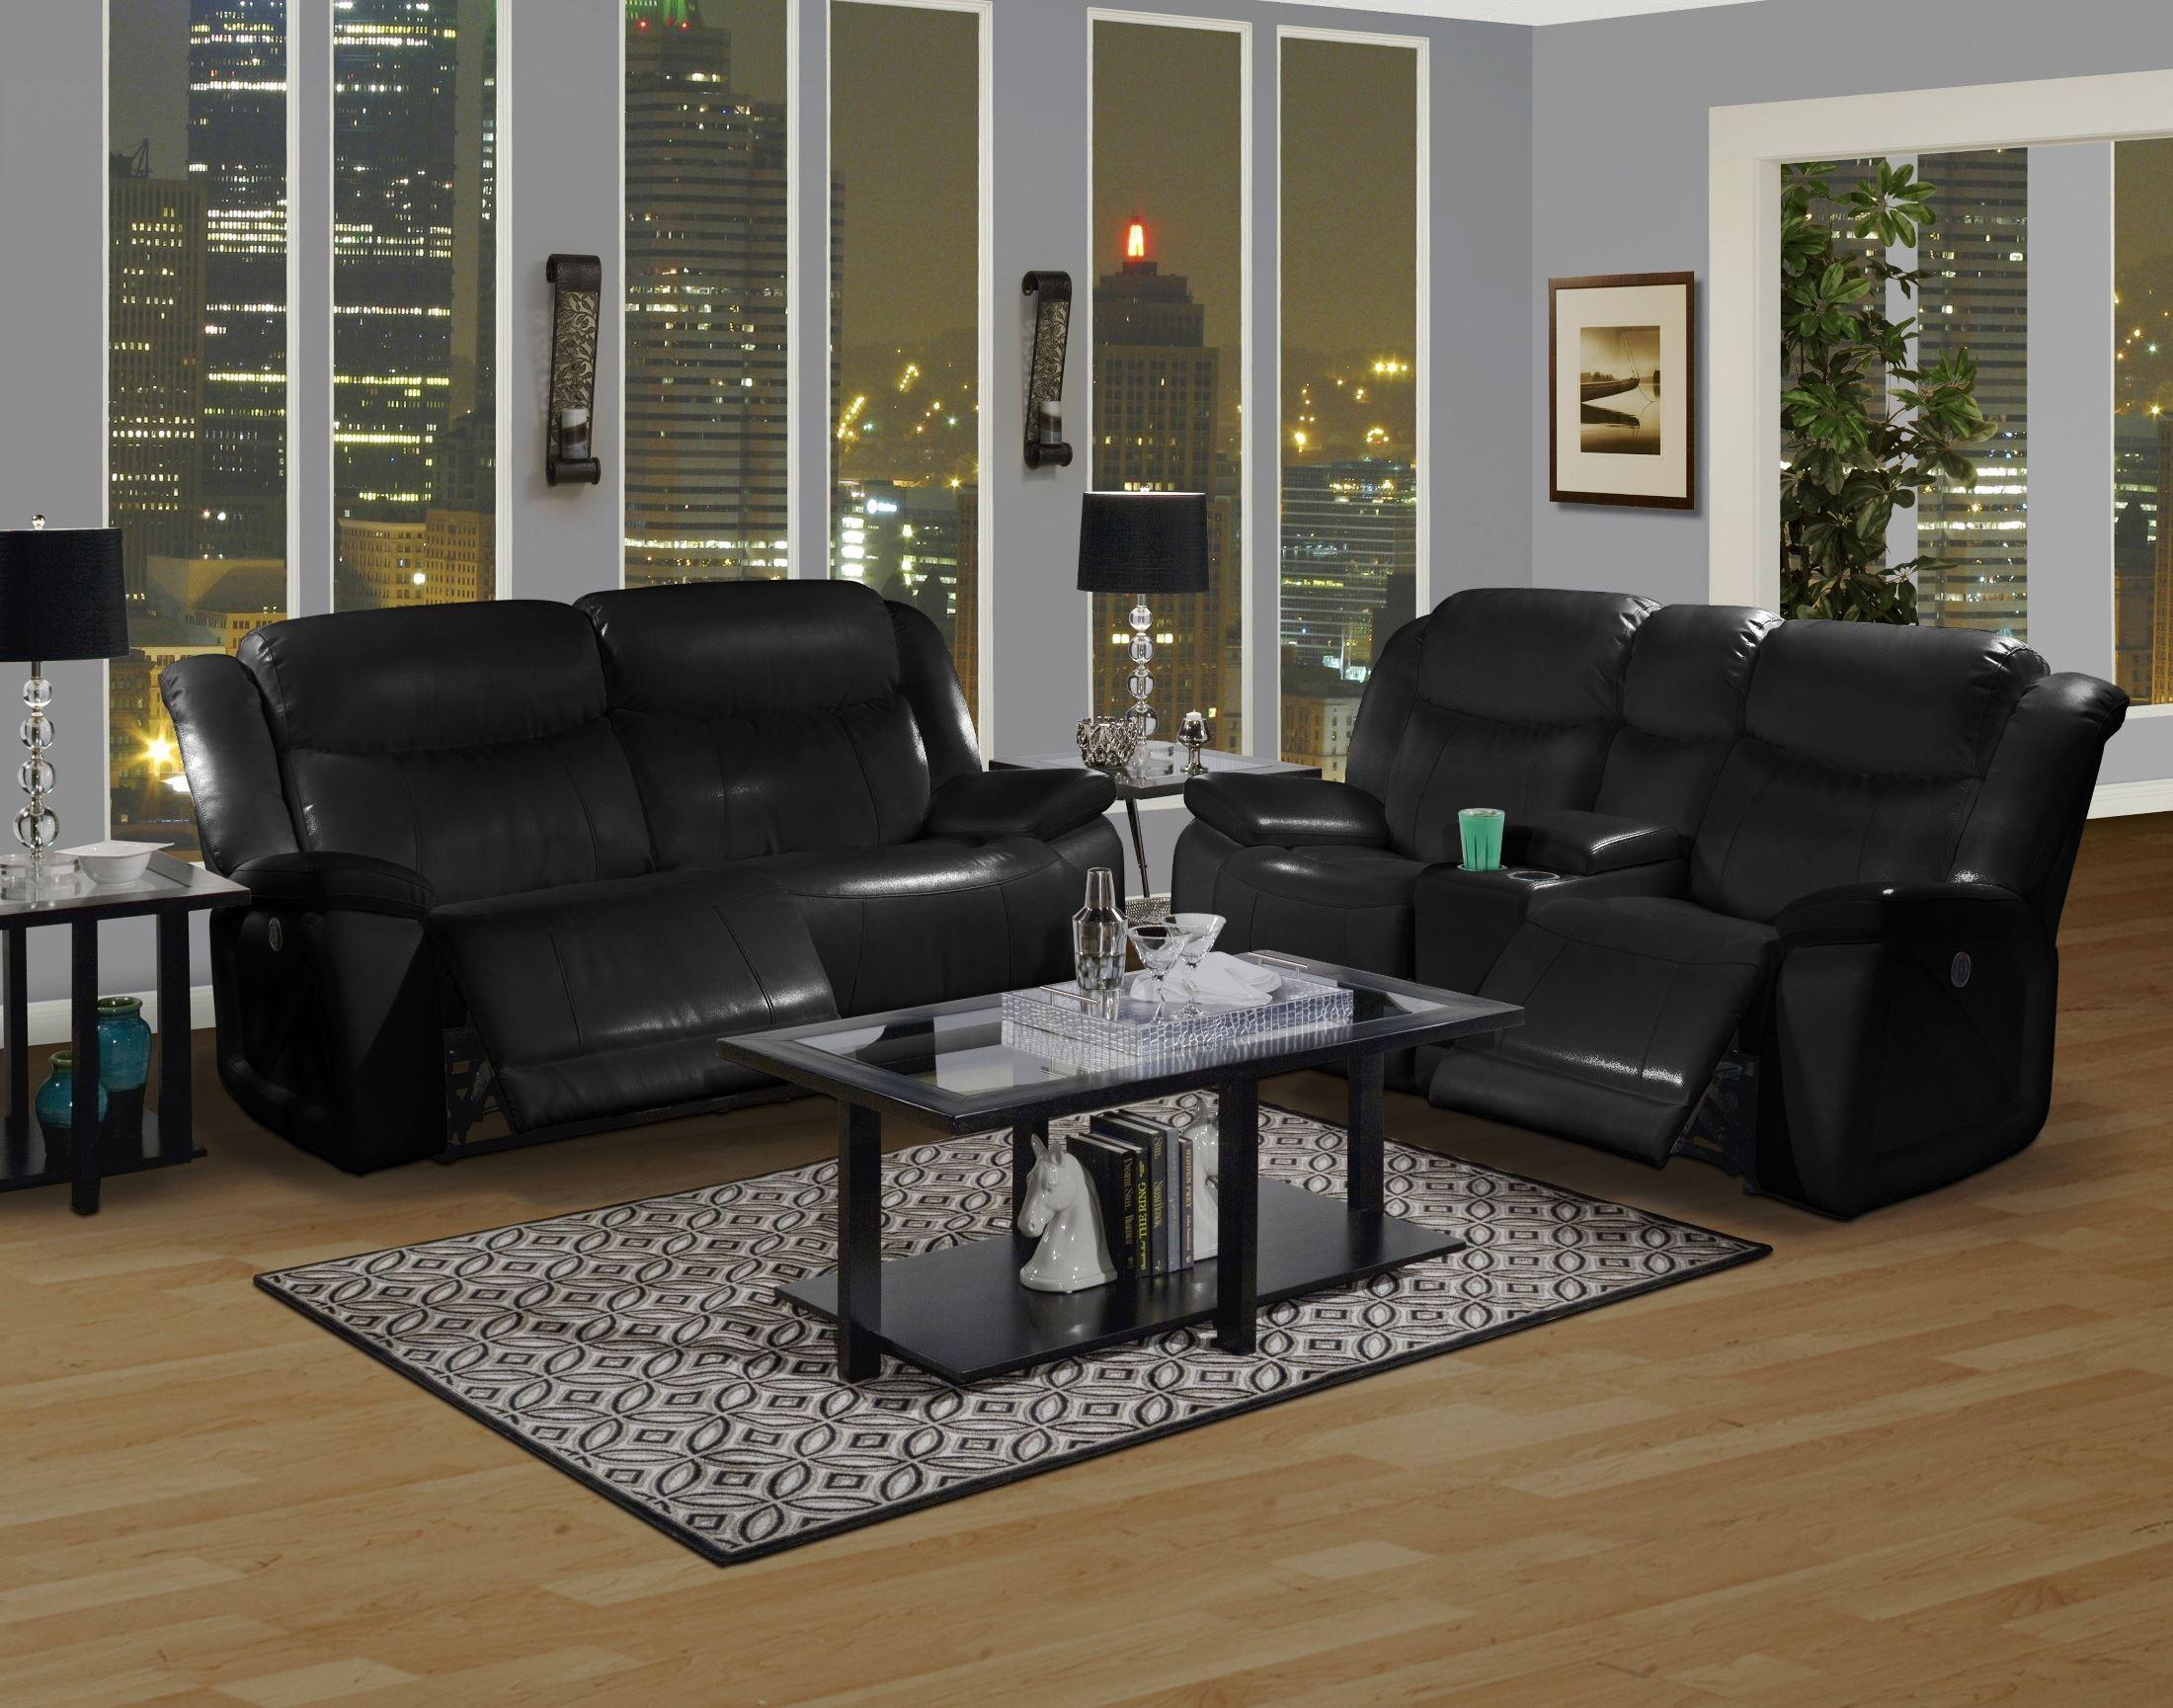 soho mesa black power reclining living room set from new